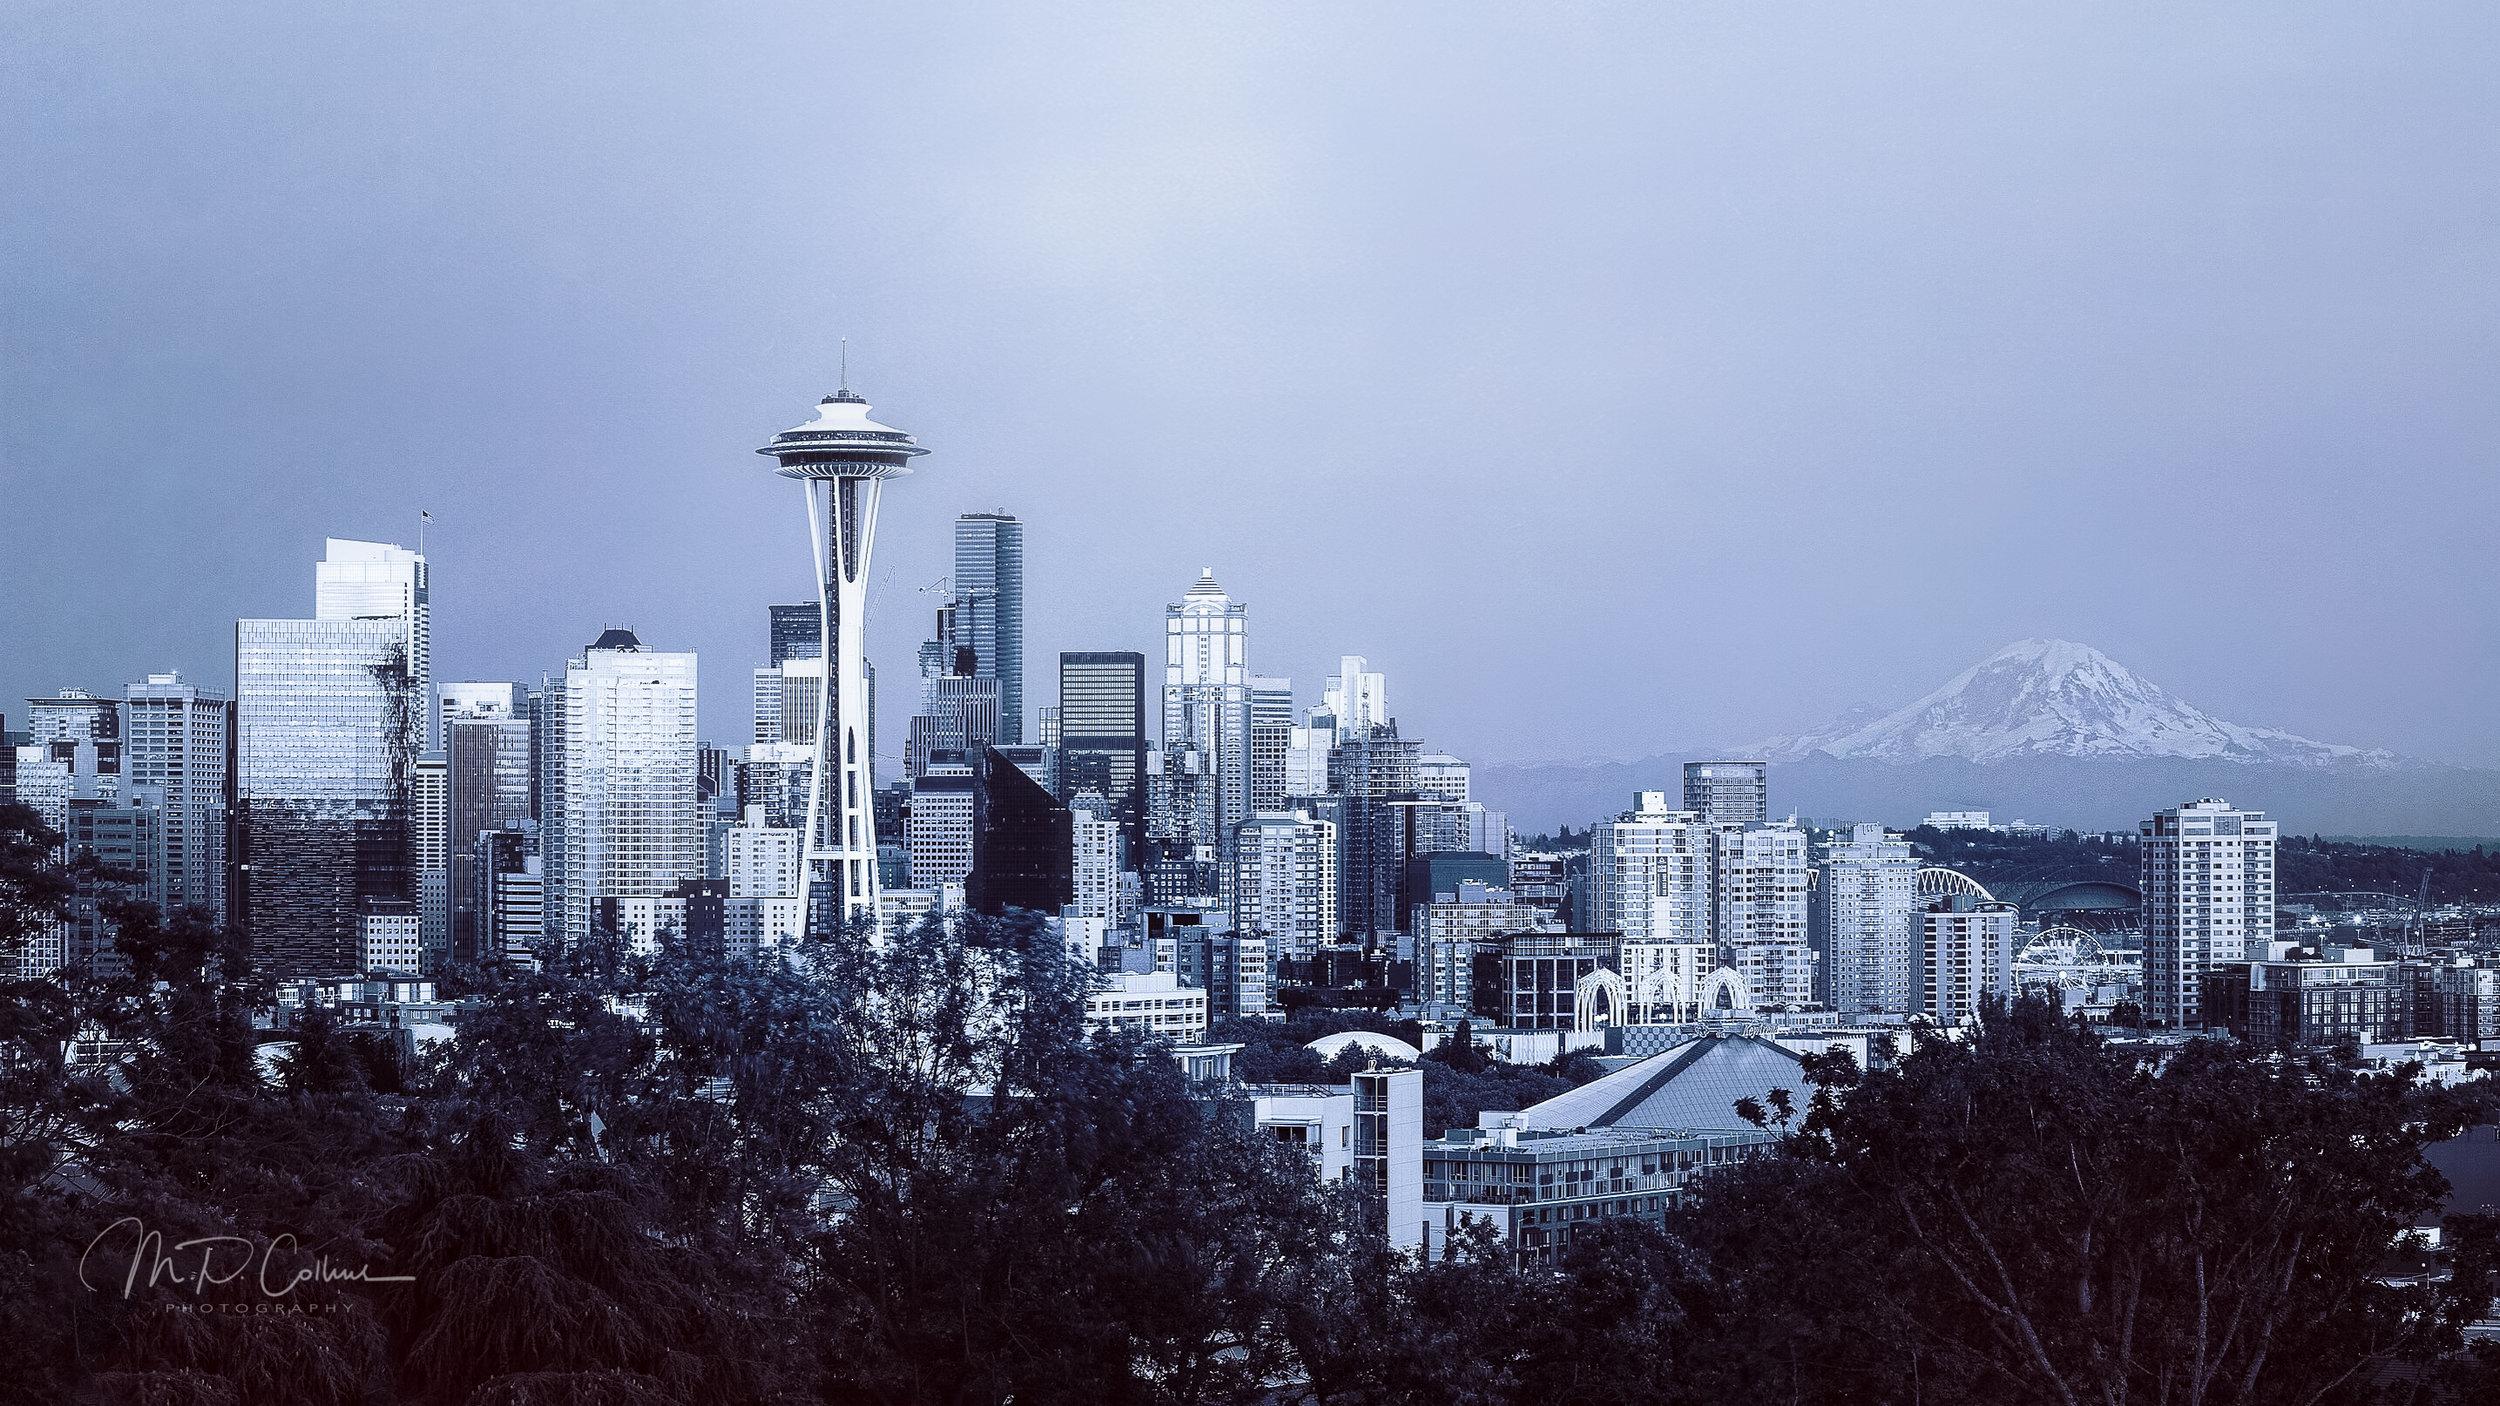 Seattle Skyline at dusk | ISO 125, 70mm, f9, 1/40